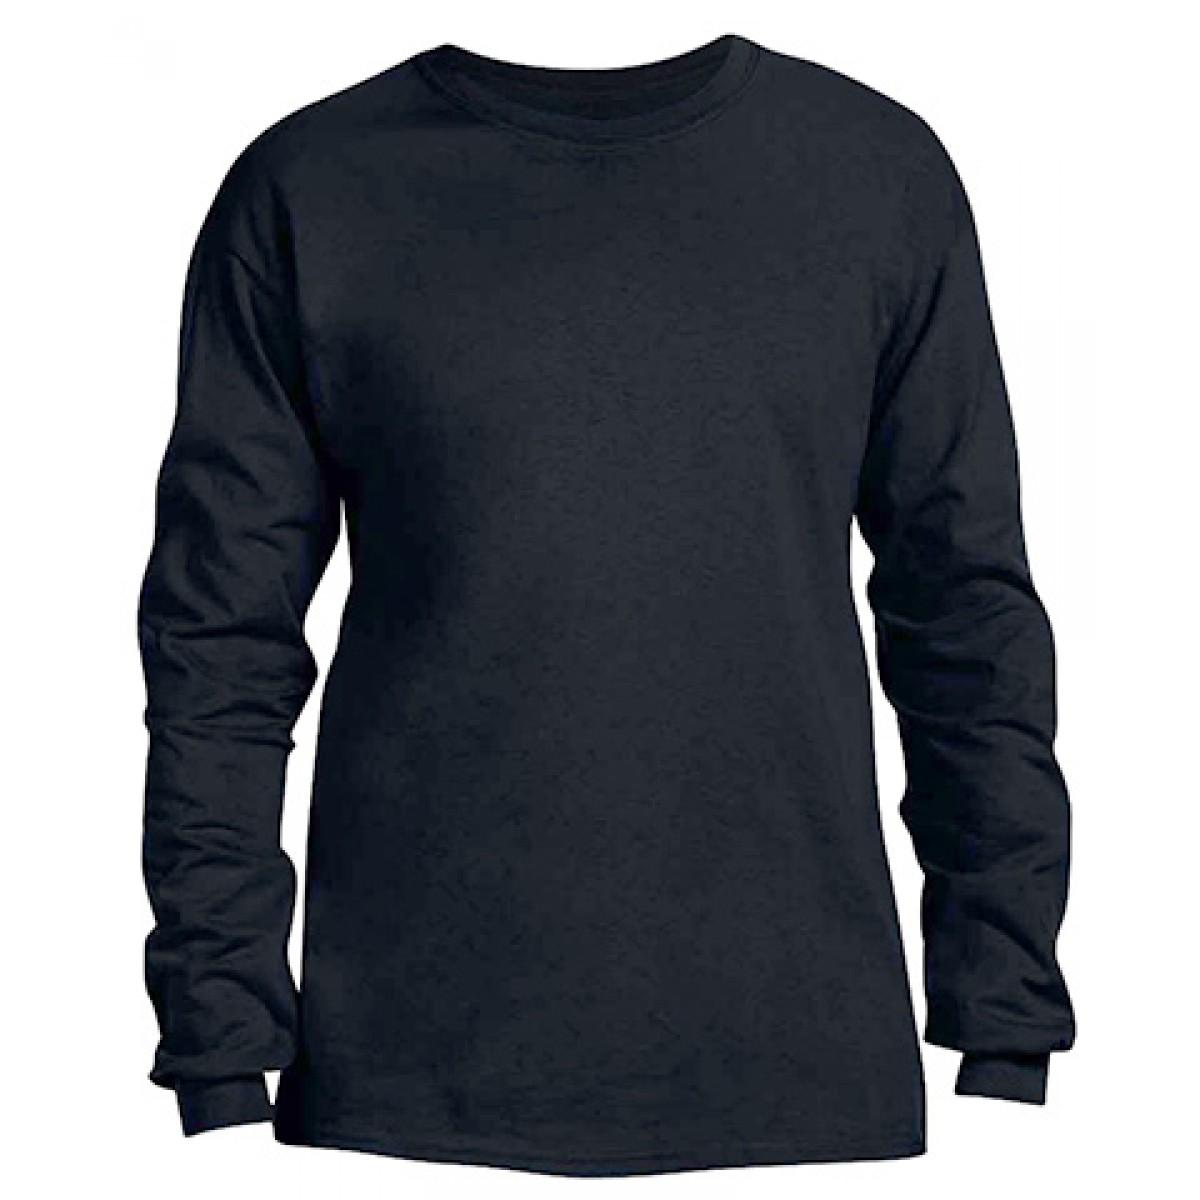 Heavy Cotton Long-Sleeve Adidas Shirt